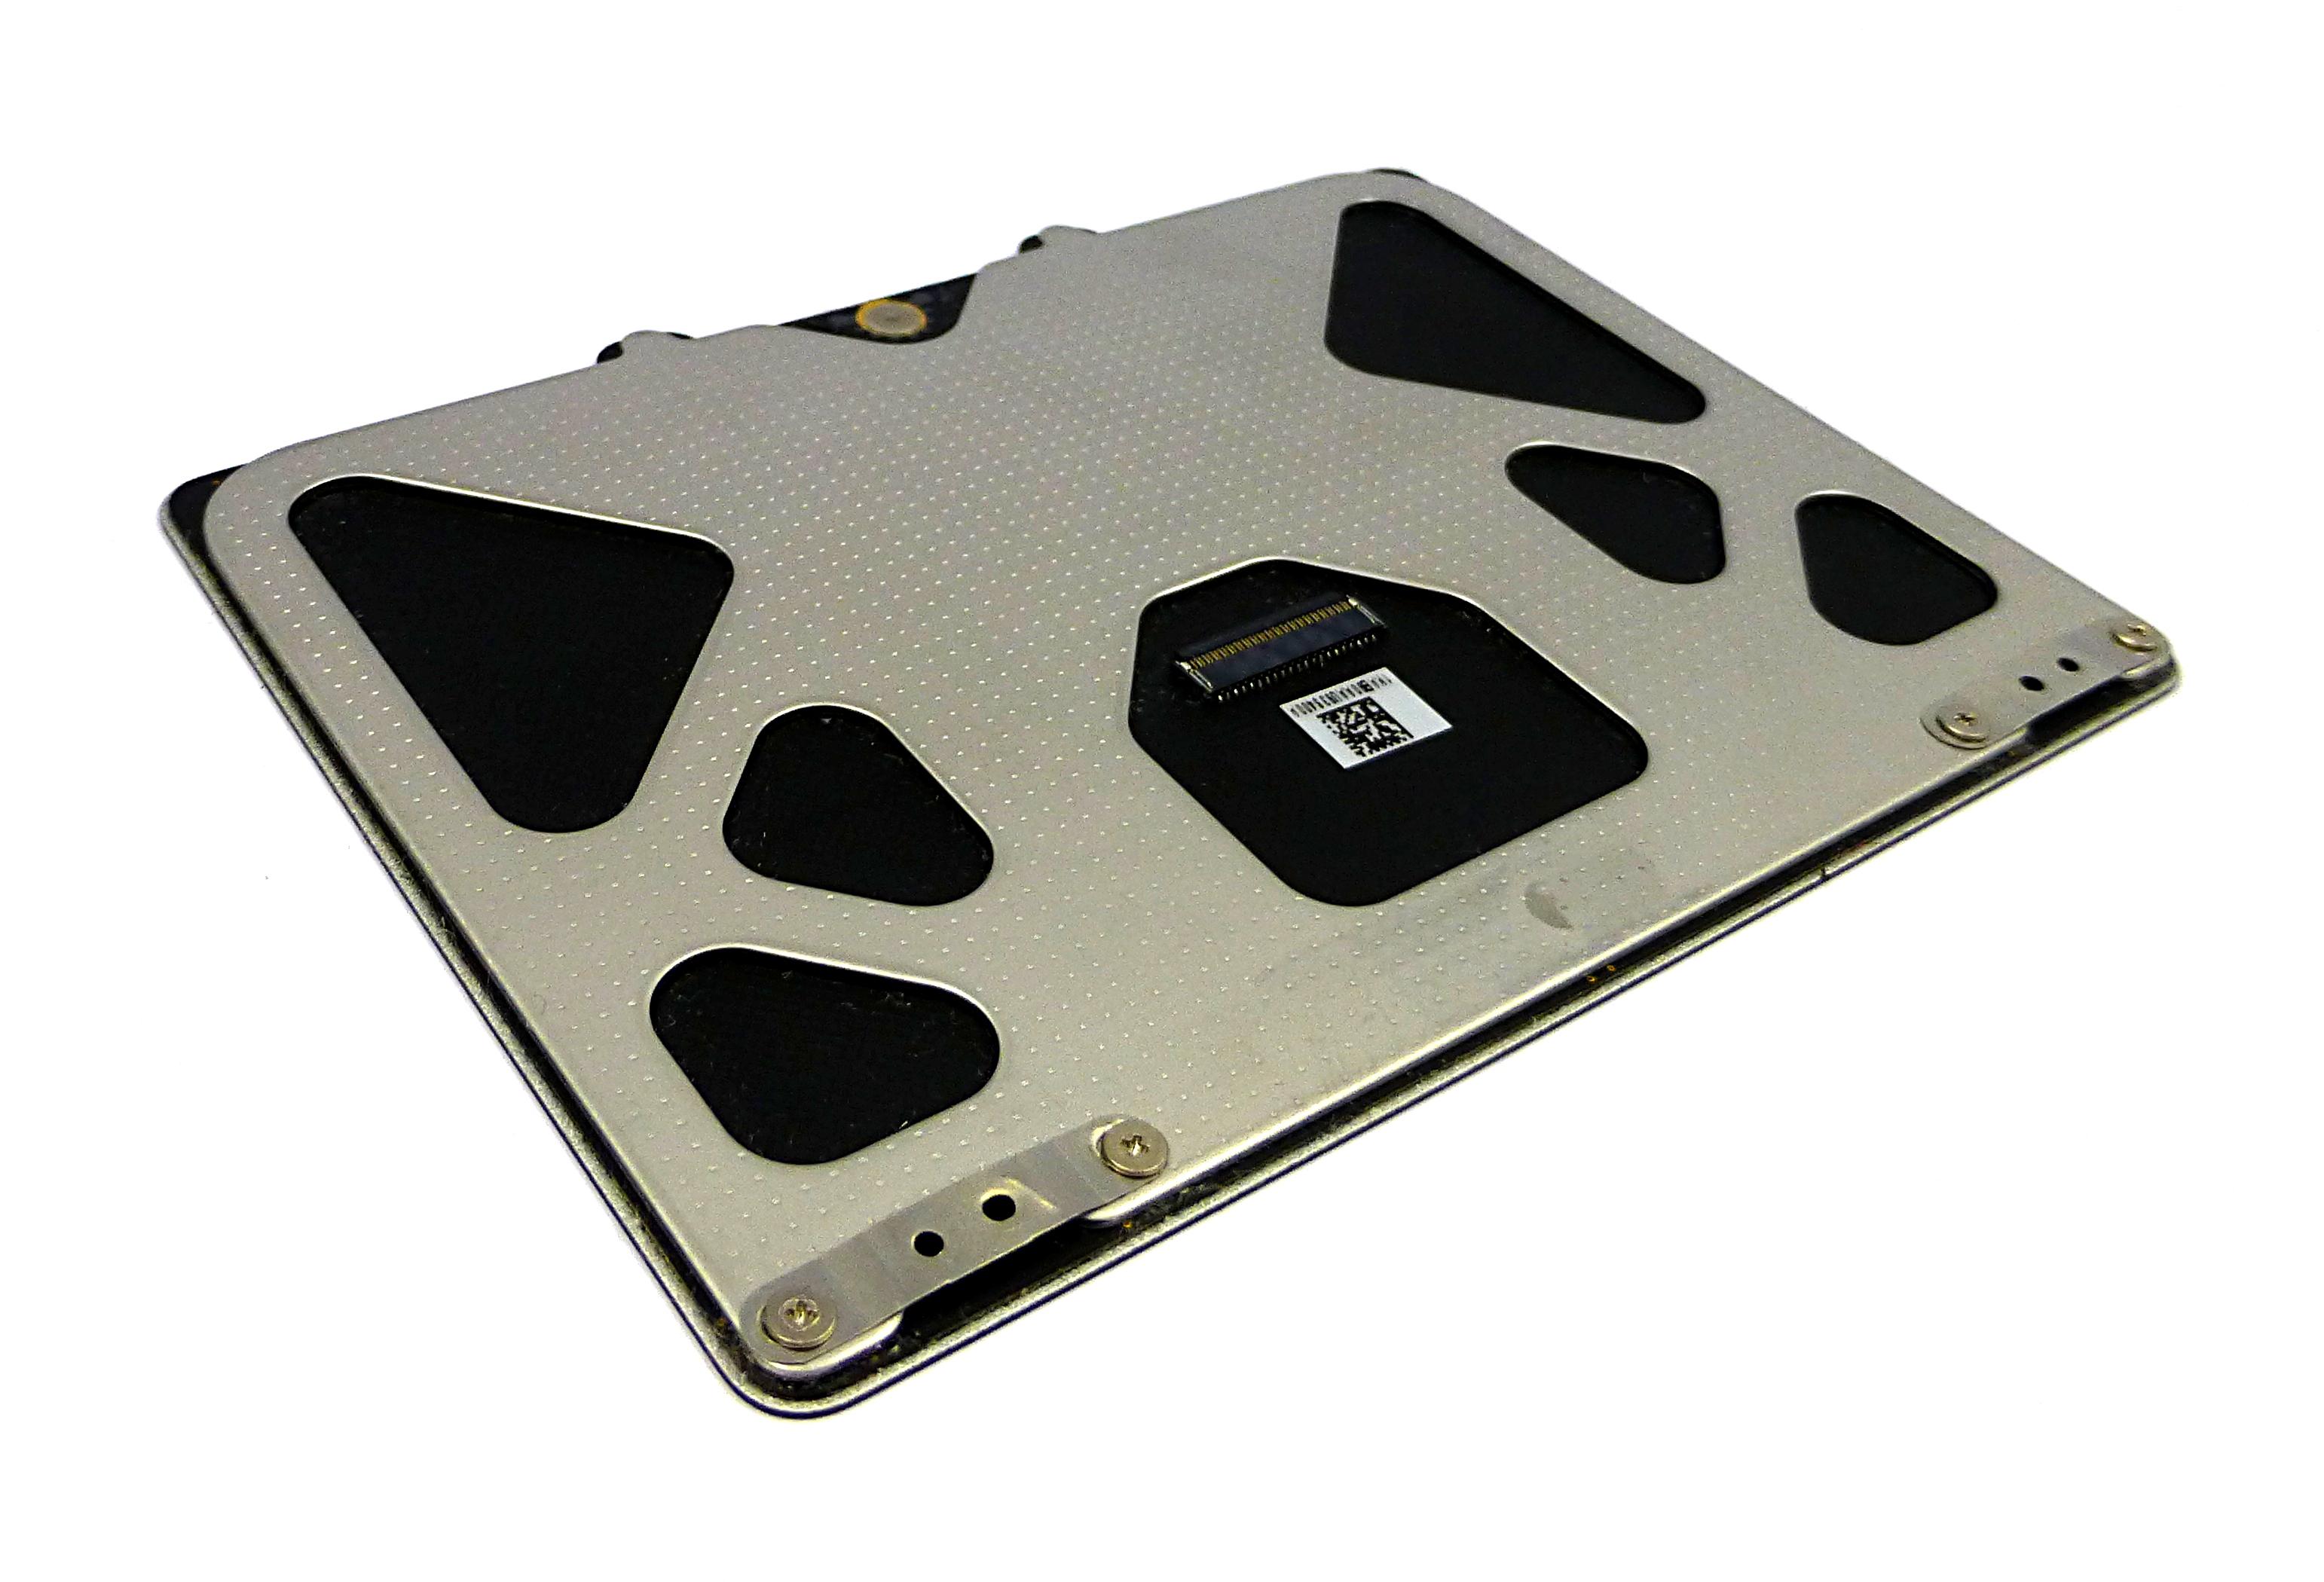 "922-9306 Apple MacBook Pro 15"" Mid 2009 Trackpad A1286 (EMC 2324*)"